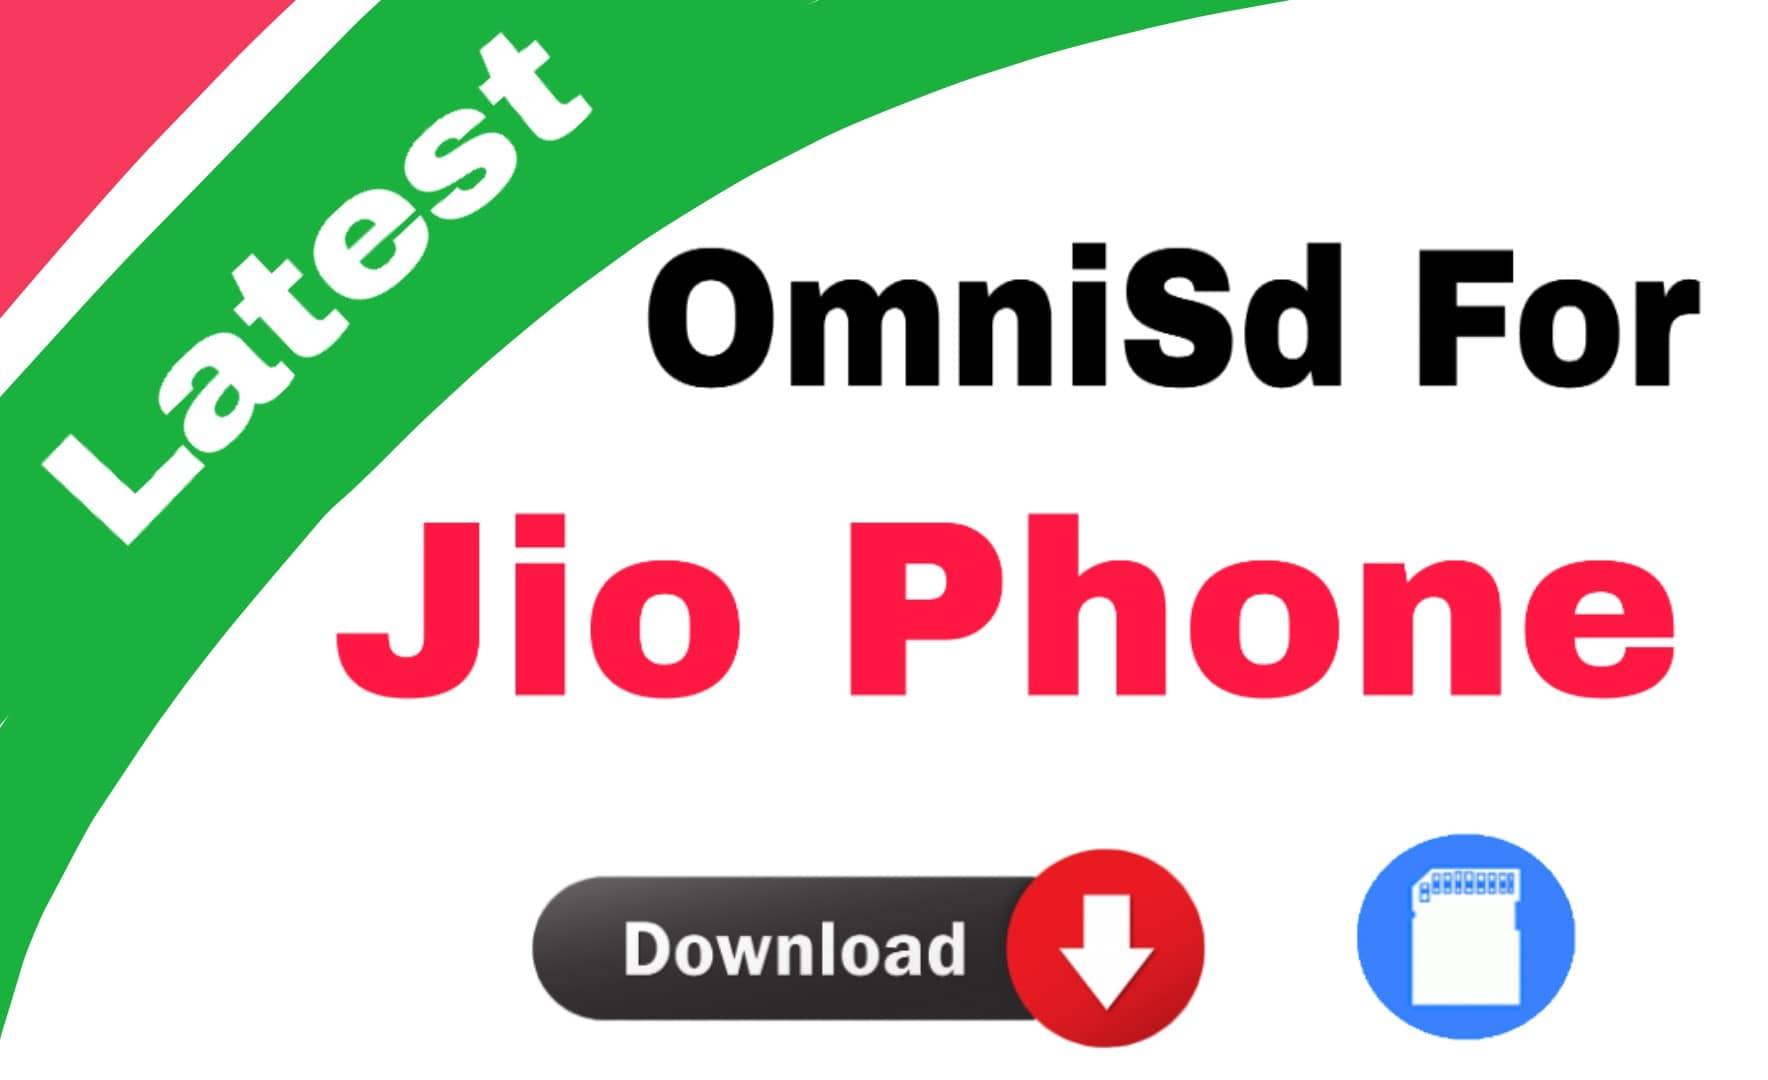 All Latest Omnisd App Download For Jio Phone | How to Install Omnisd Online | Omnisd Download 2